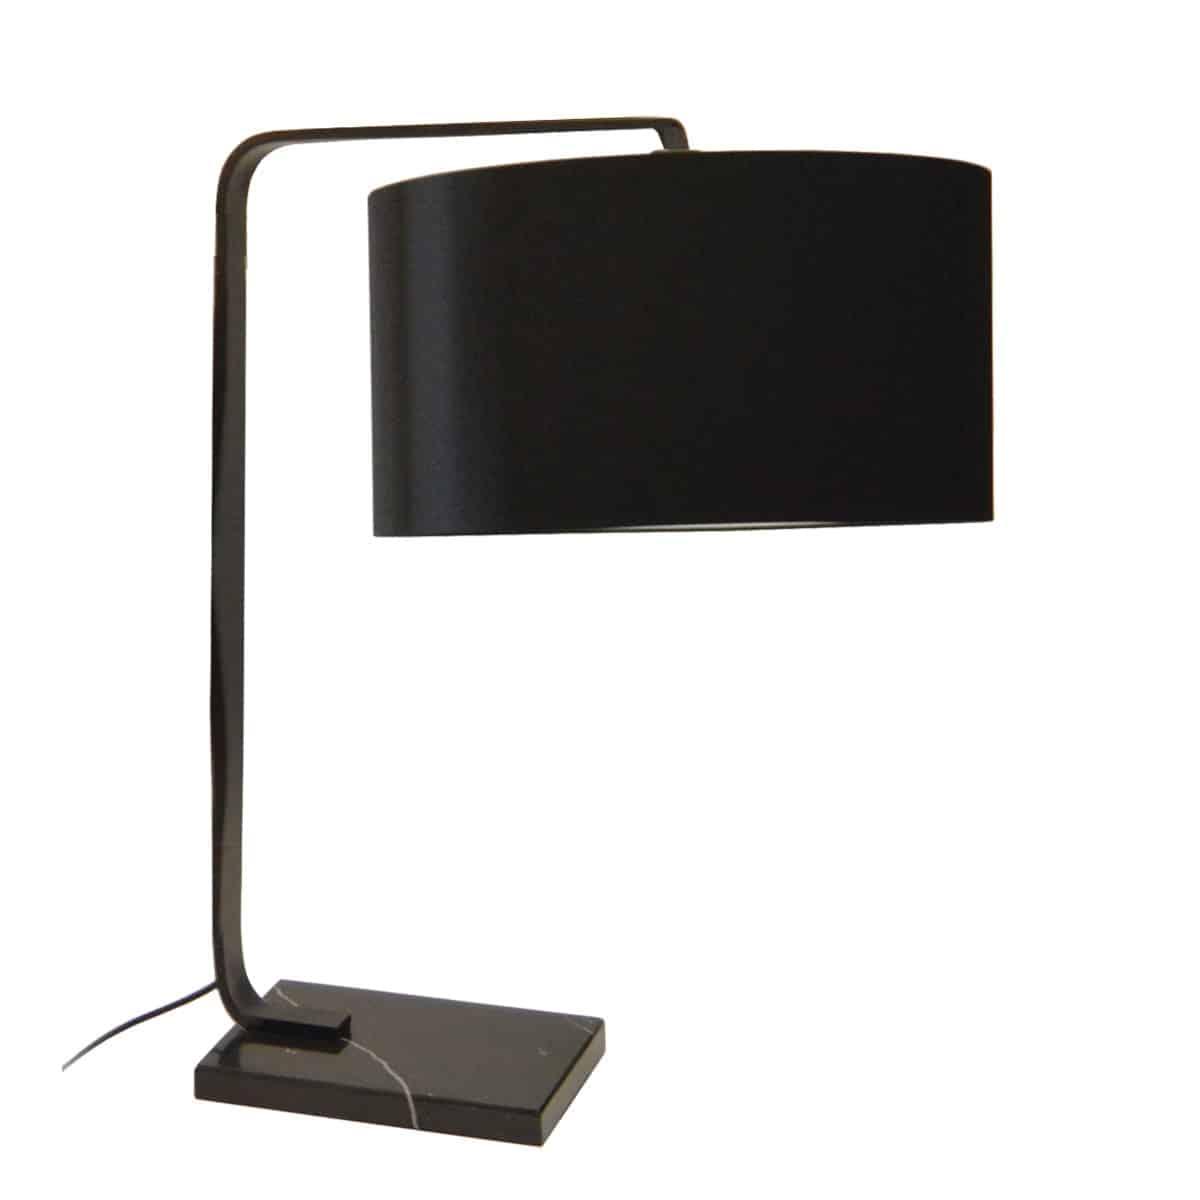 1 Light  Incandescent Table Lamp, Black Finish